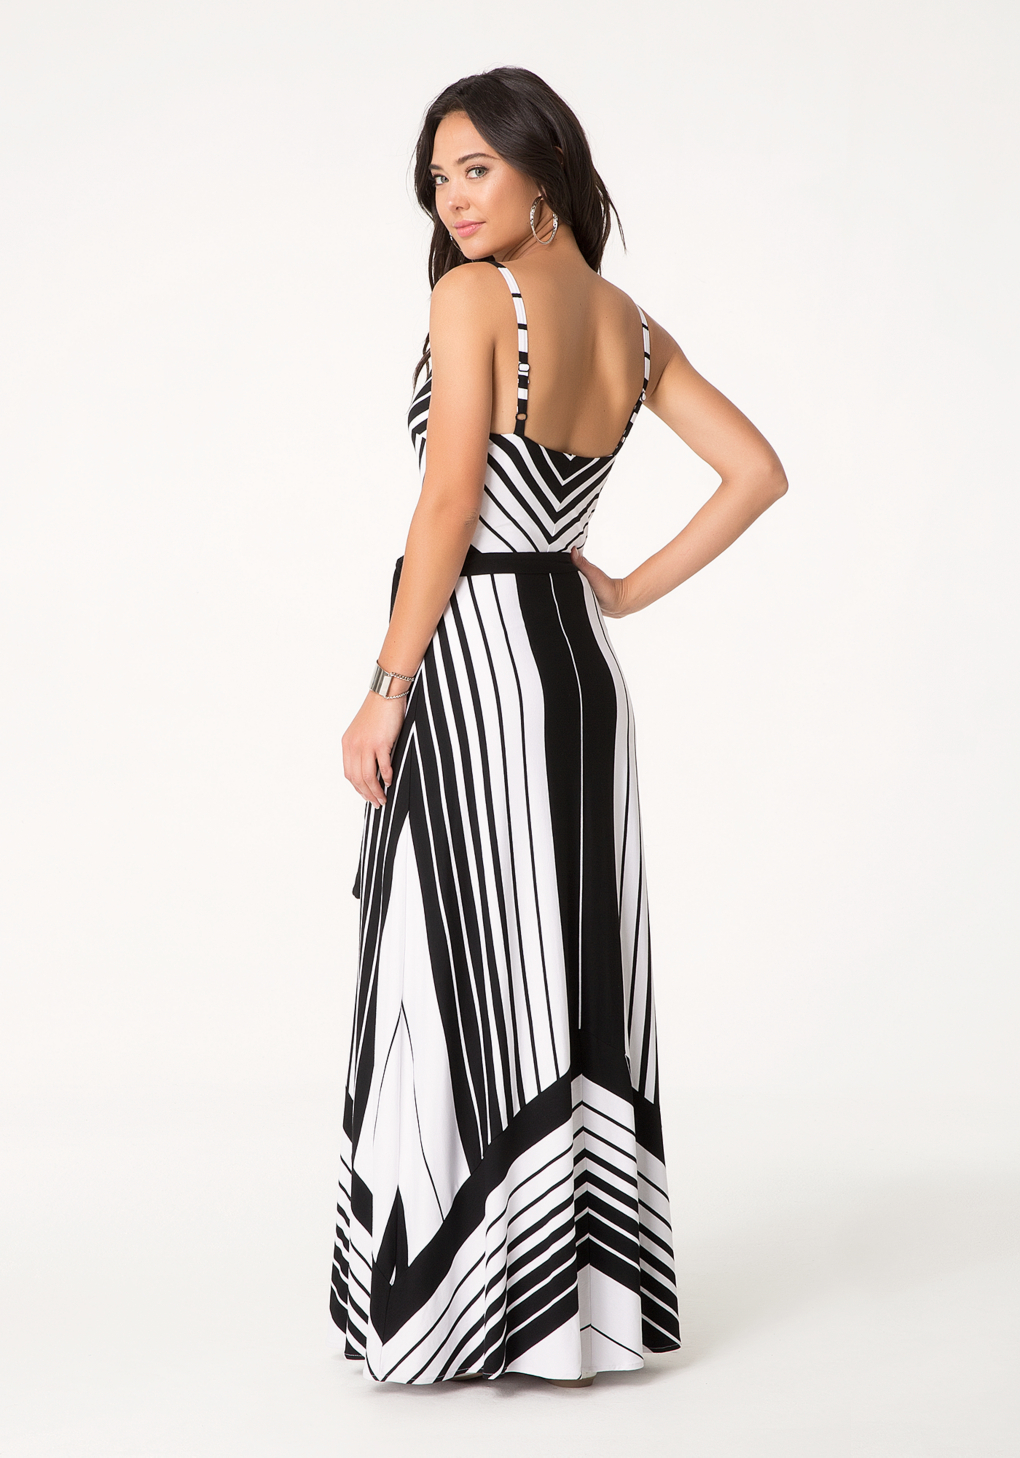 871924e71cd Petite Maxi Dresses Black And White - Gomes Weine AG